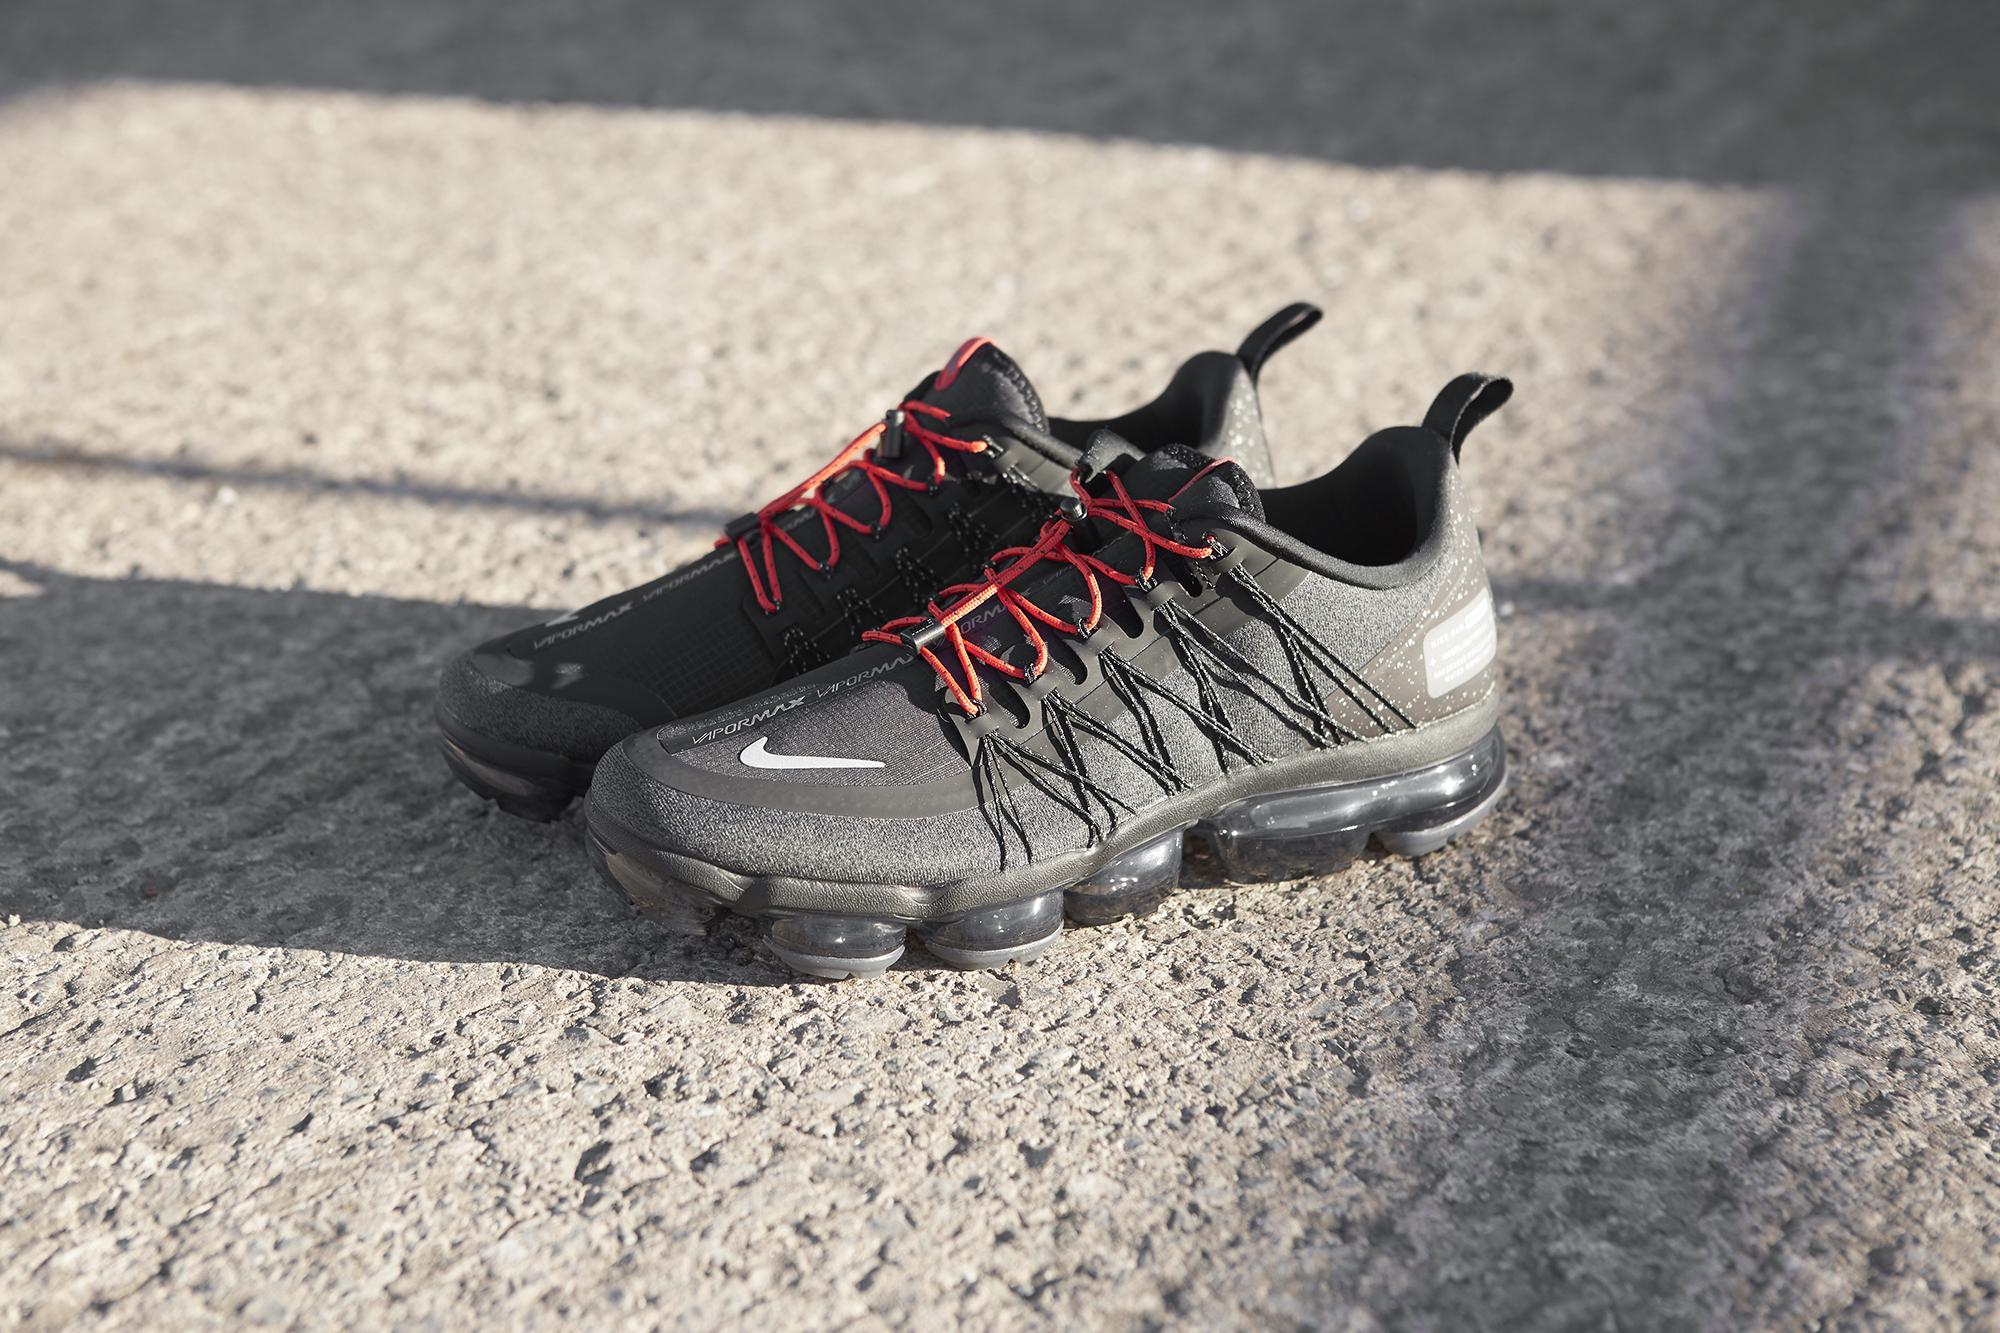 Nike Air VaporMax Utility Run 'Black